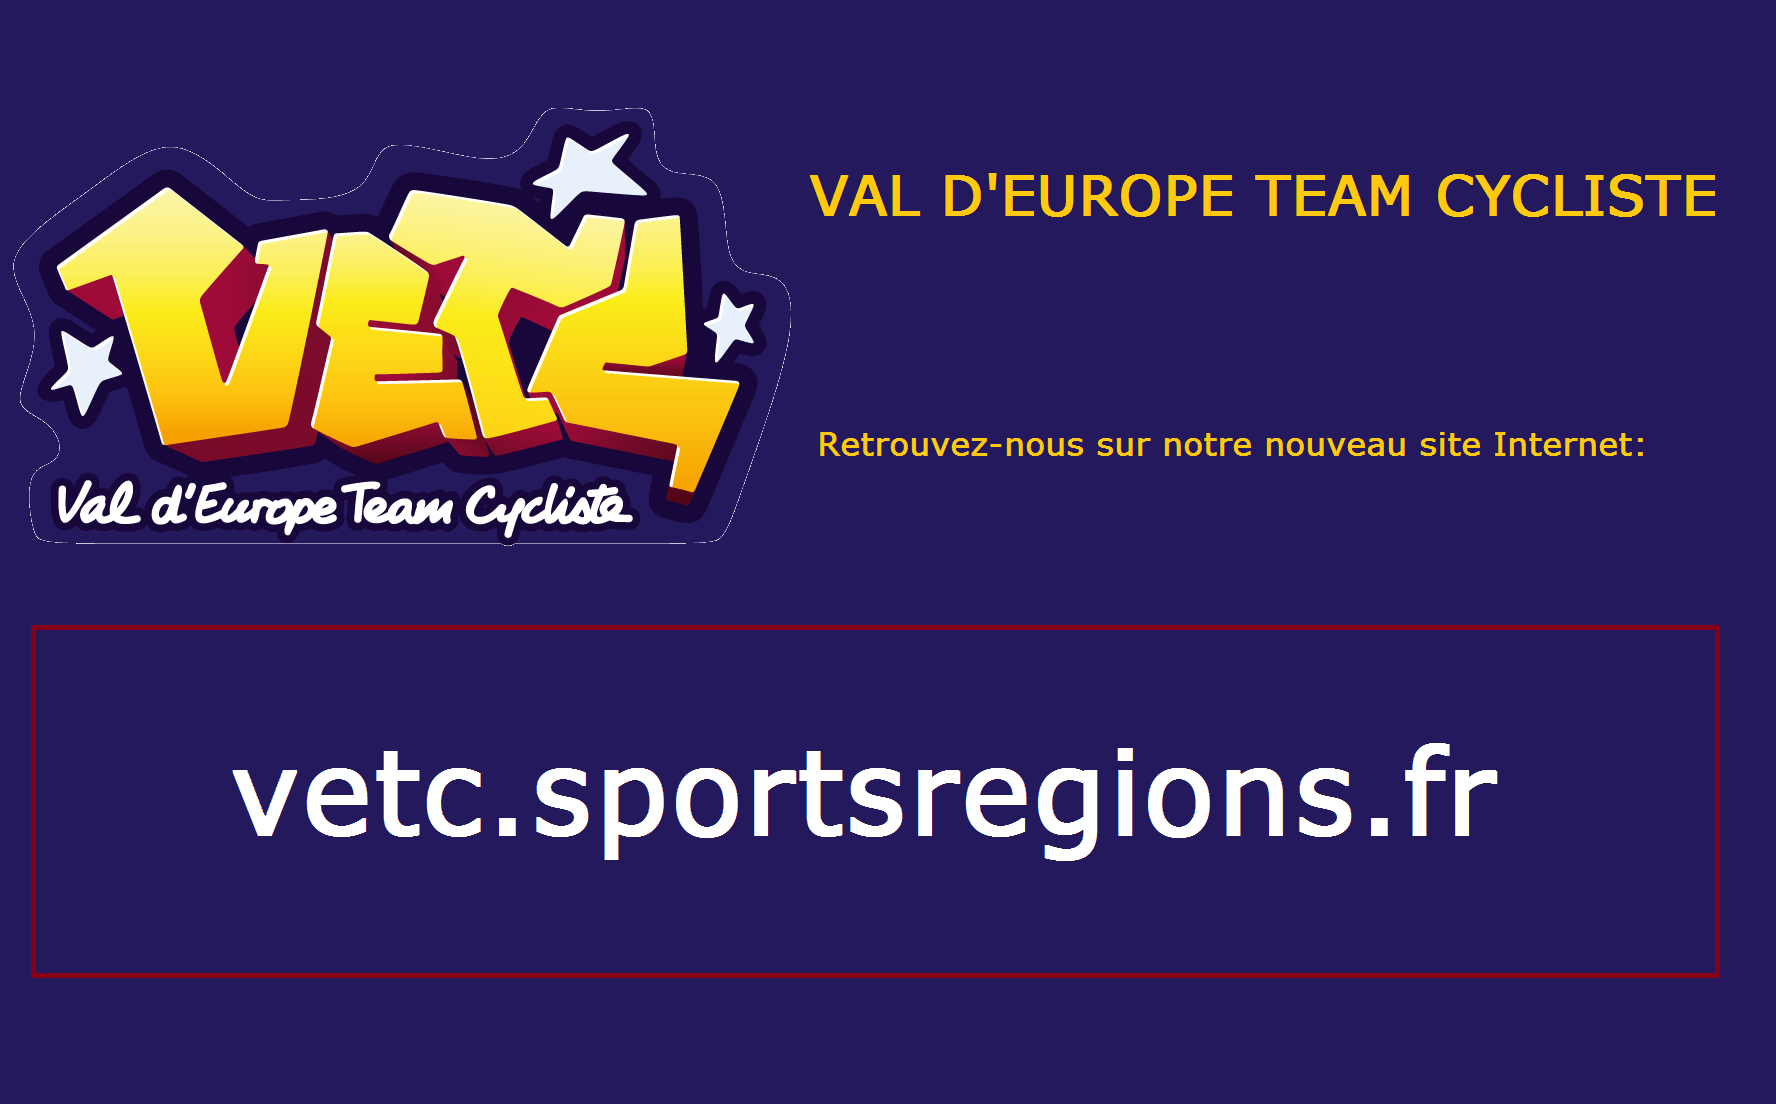 VAL D' EUROPE TEAM CYCLISTE